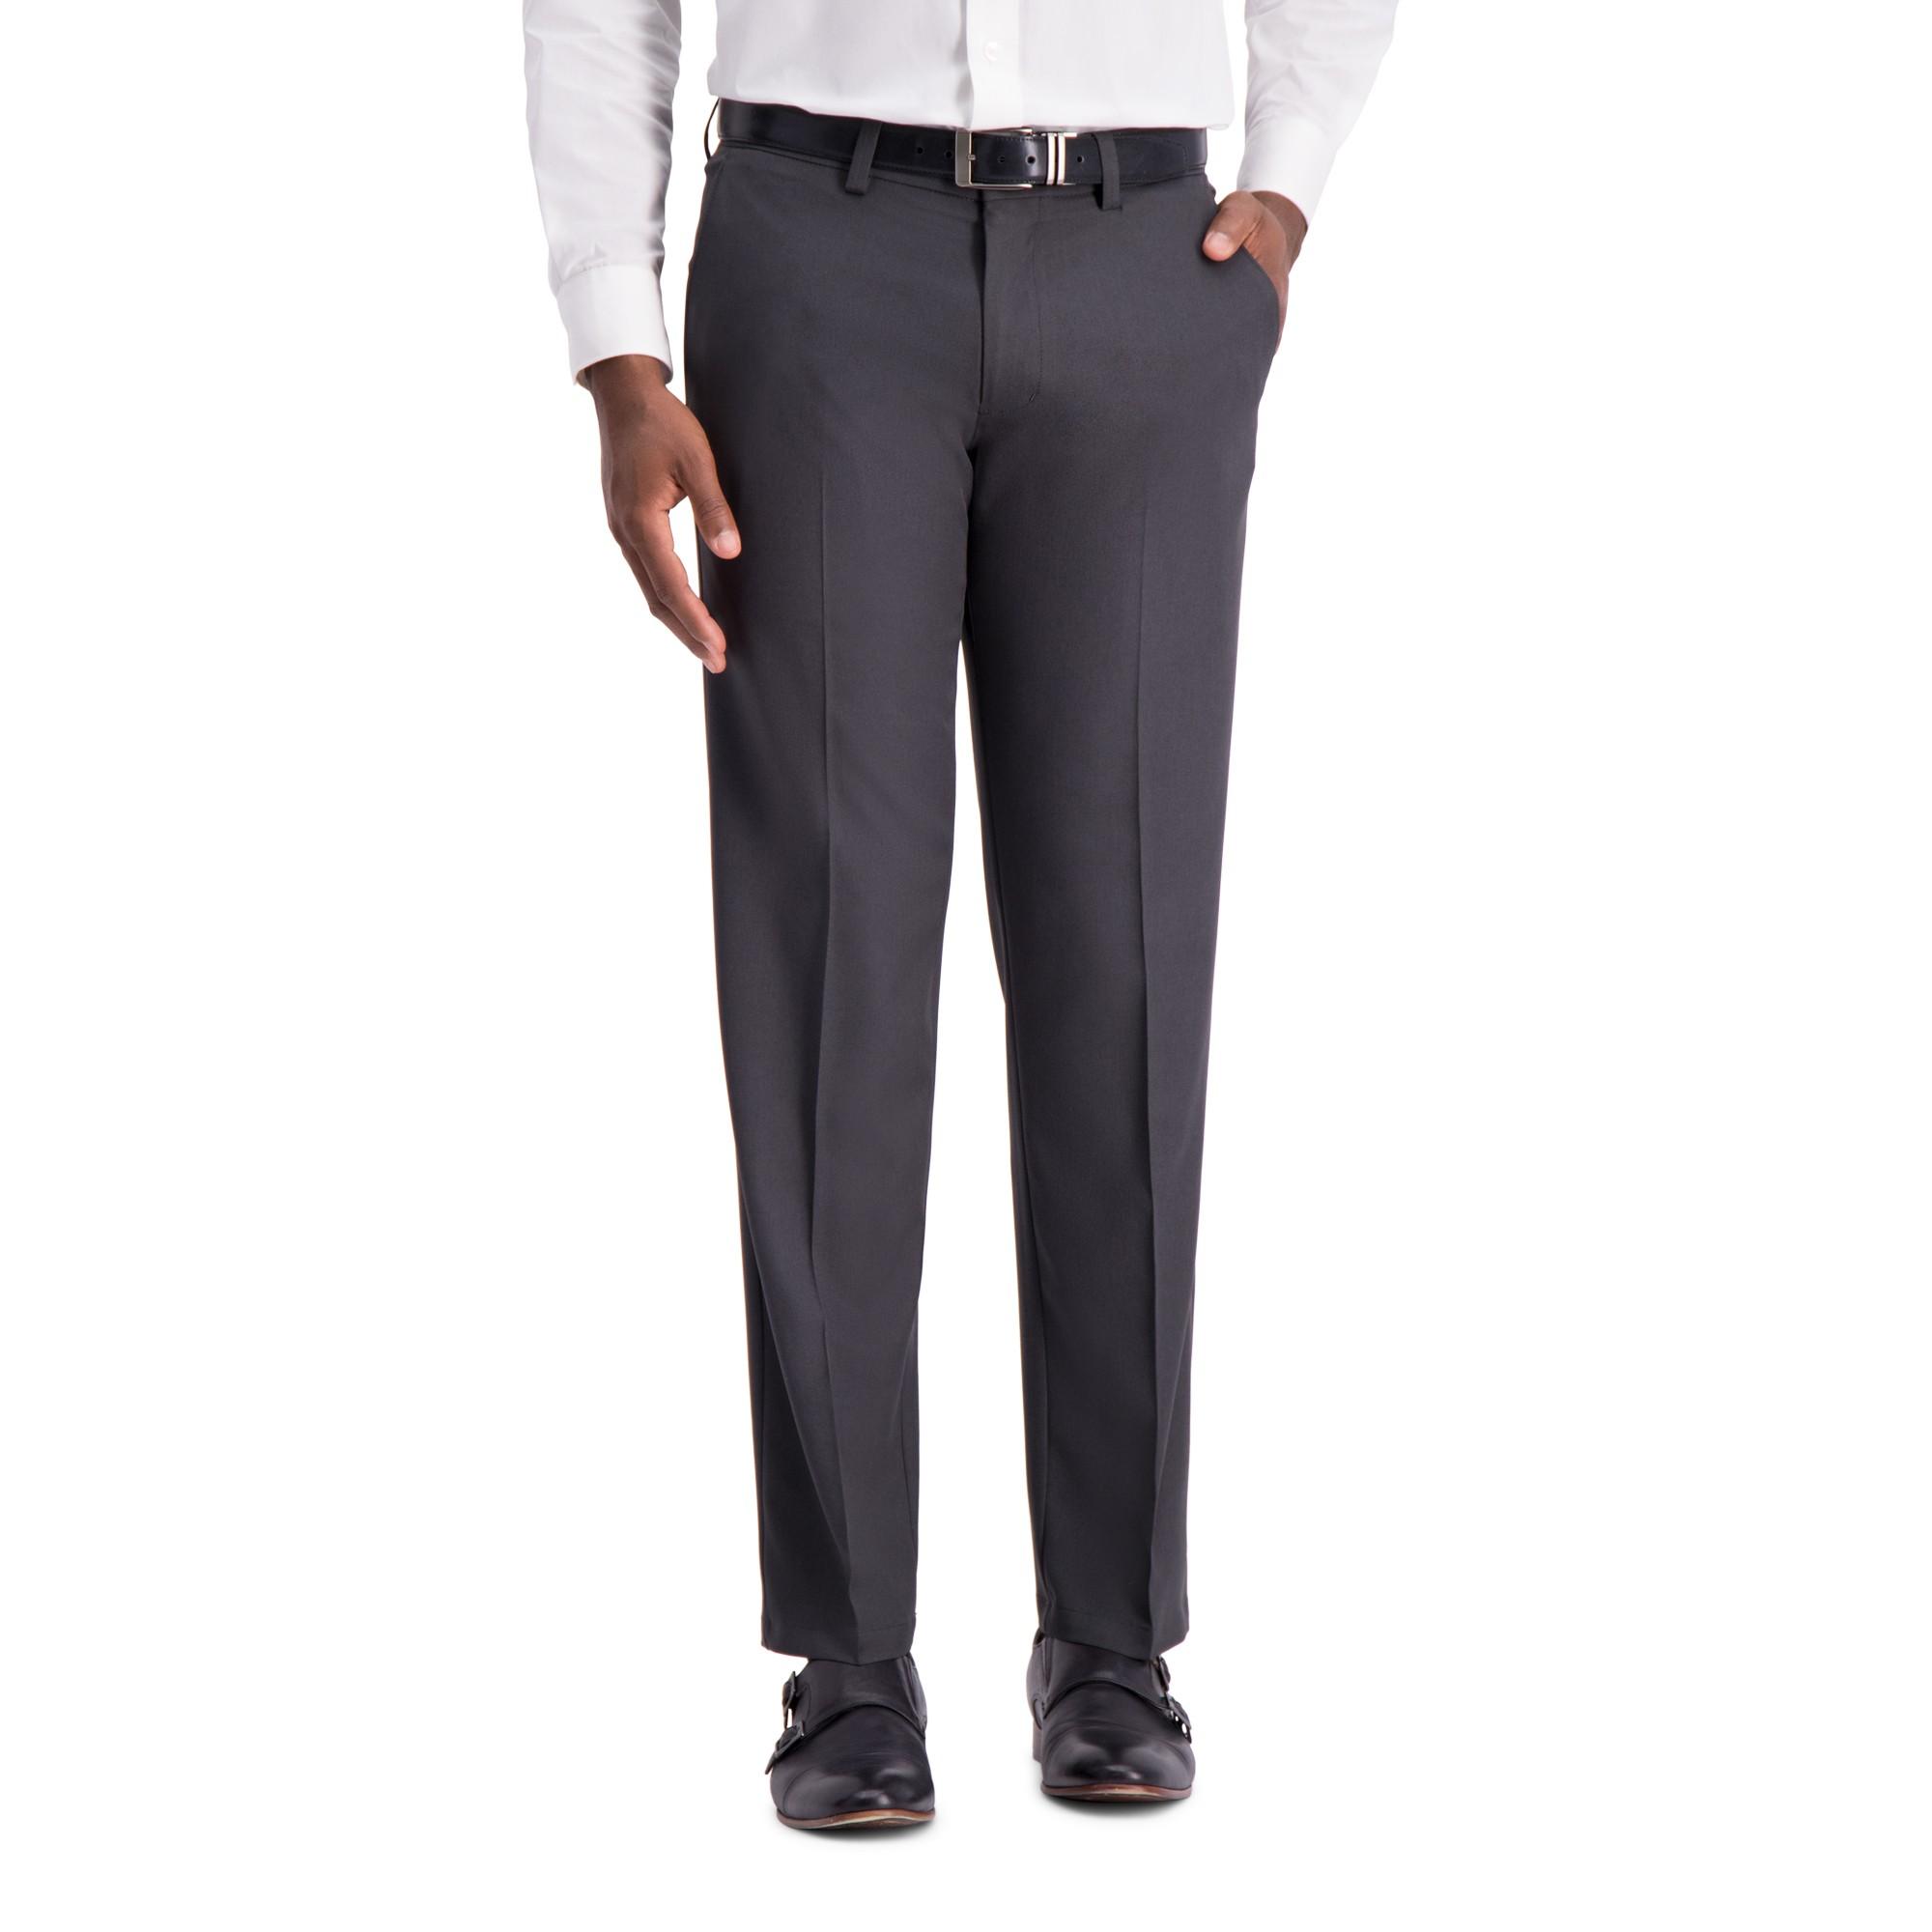 Haggar H26 Men's Big & Tall Straight Fit 4 Way Stretch Trousers - Heather Gray 50x32